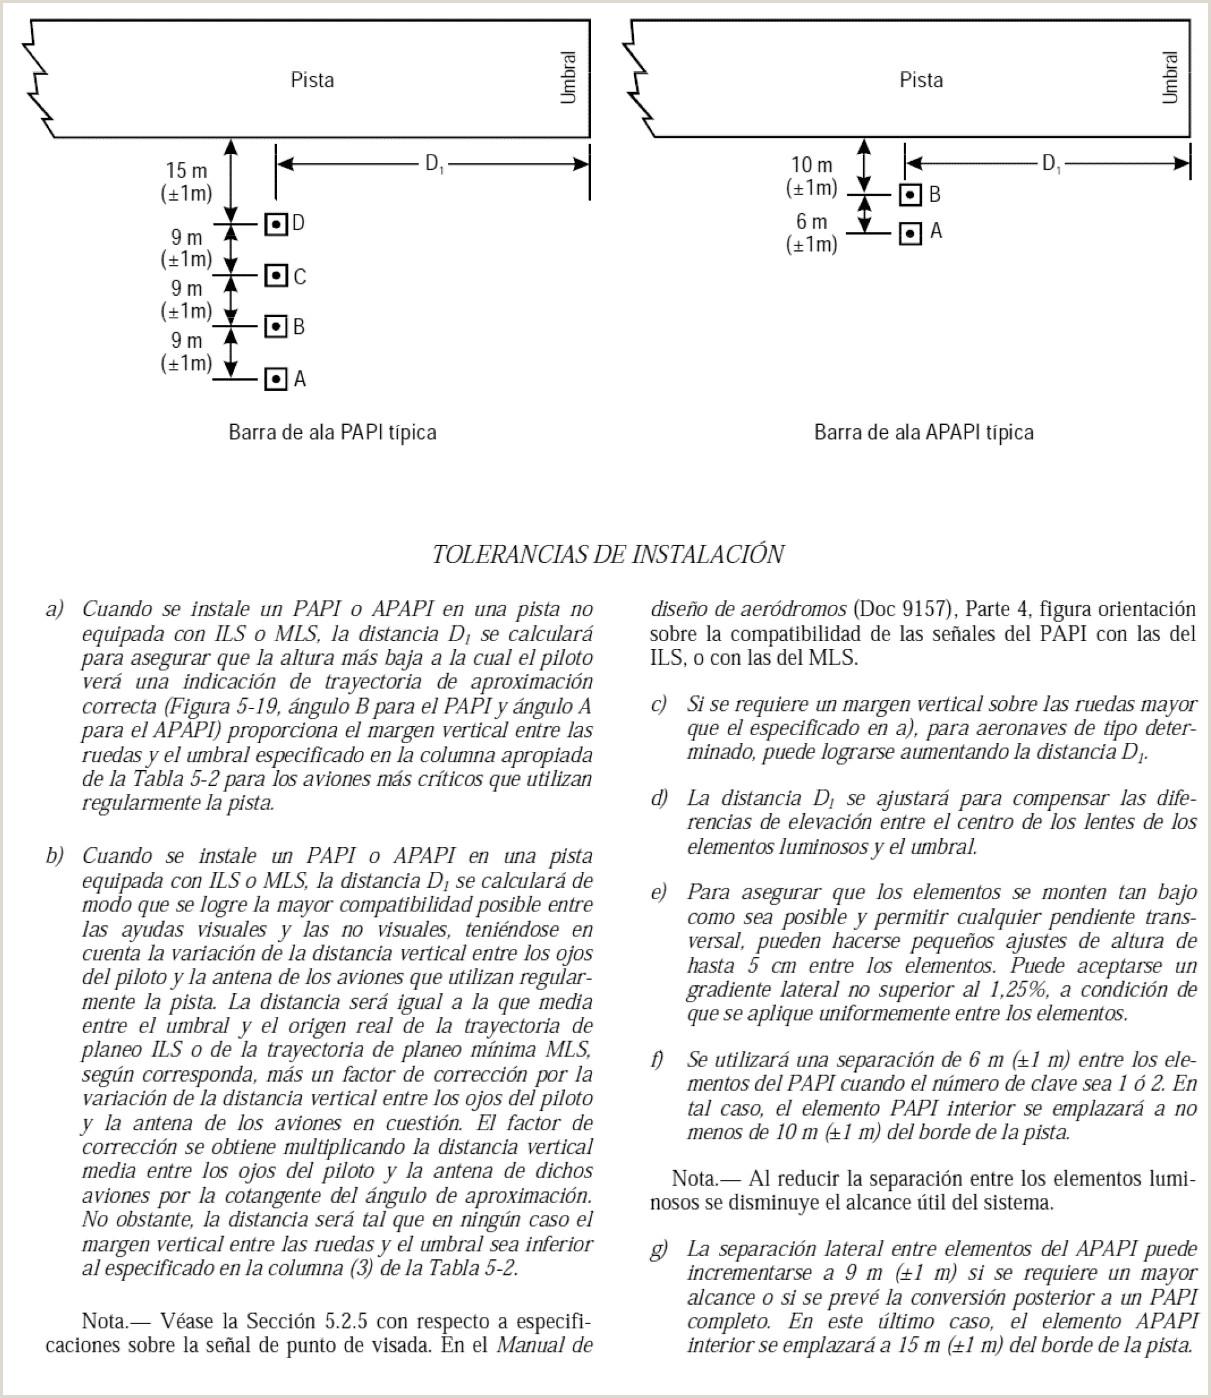 Descargar Hoja De Vida Doc Boe Documento Consolidado Boe A 2009 9043